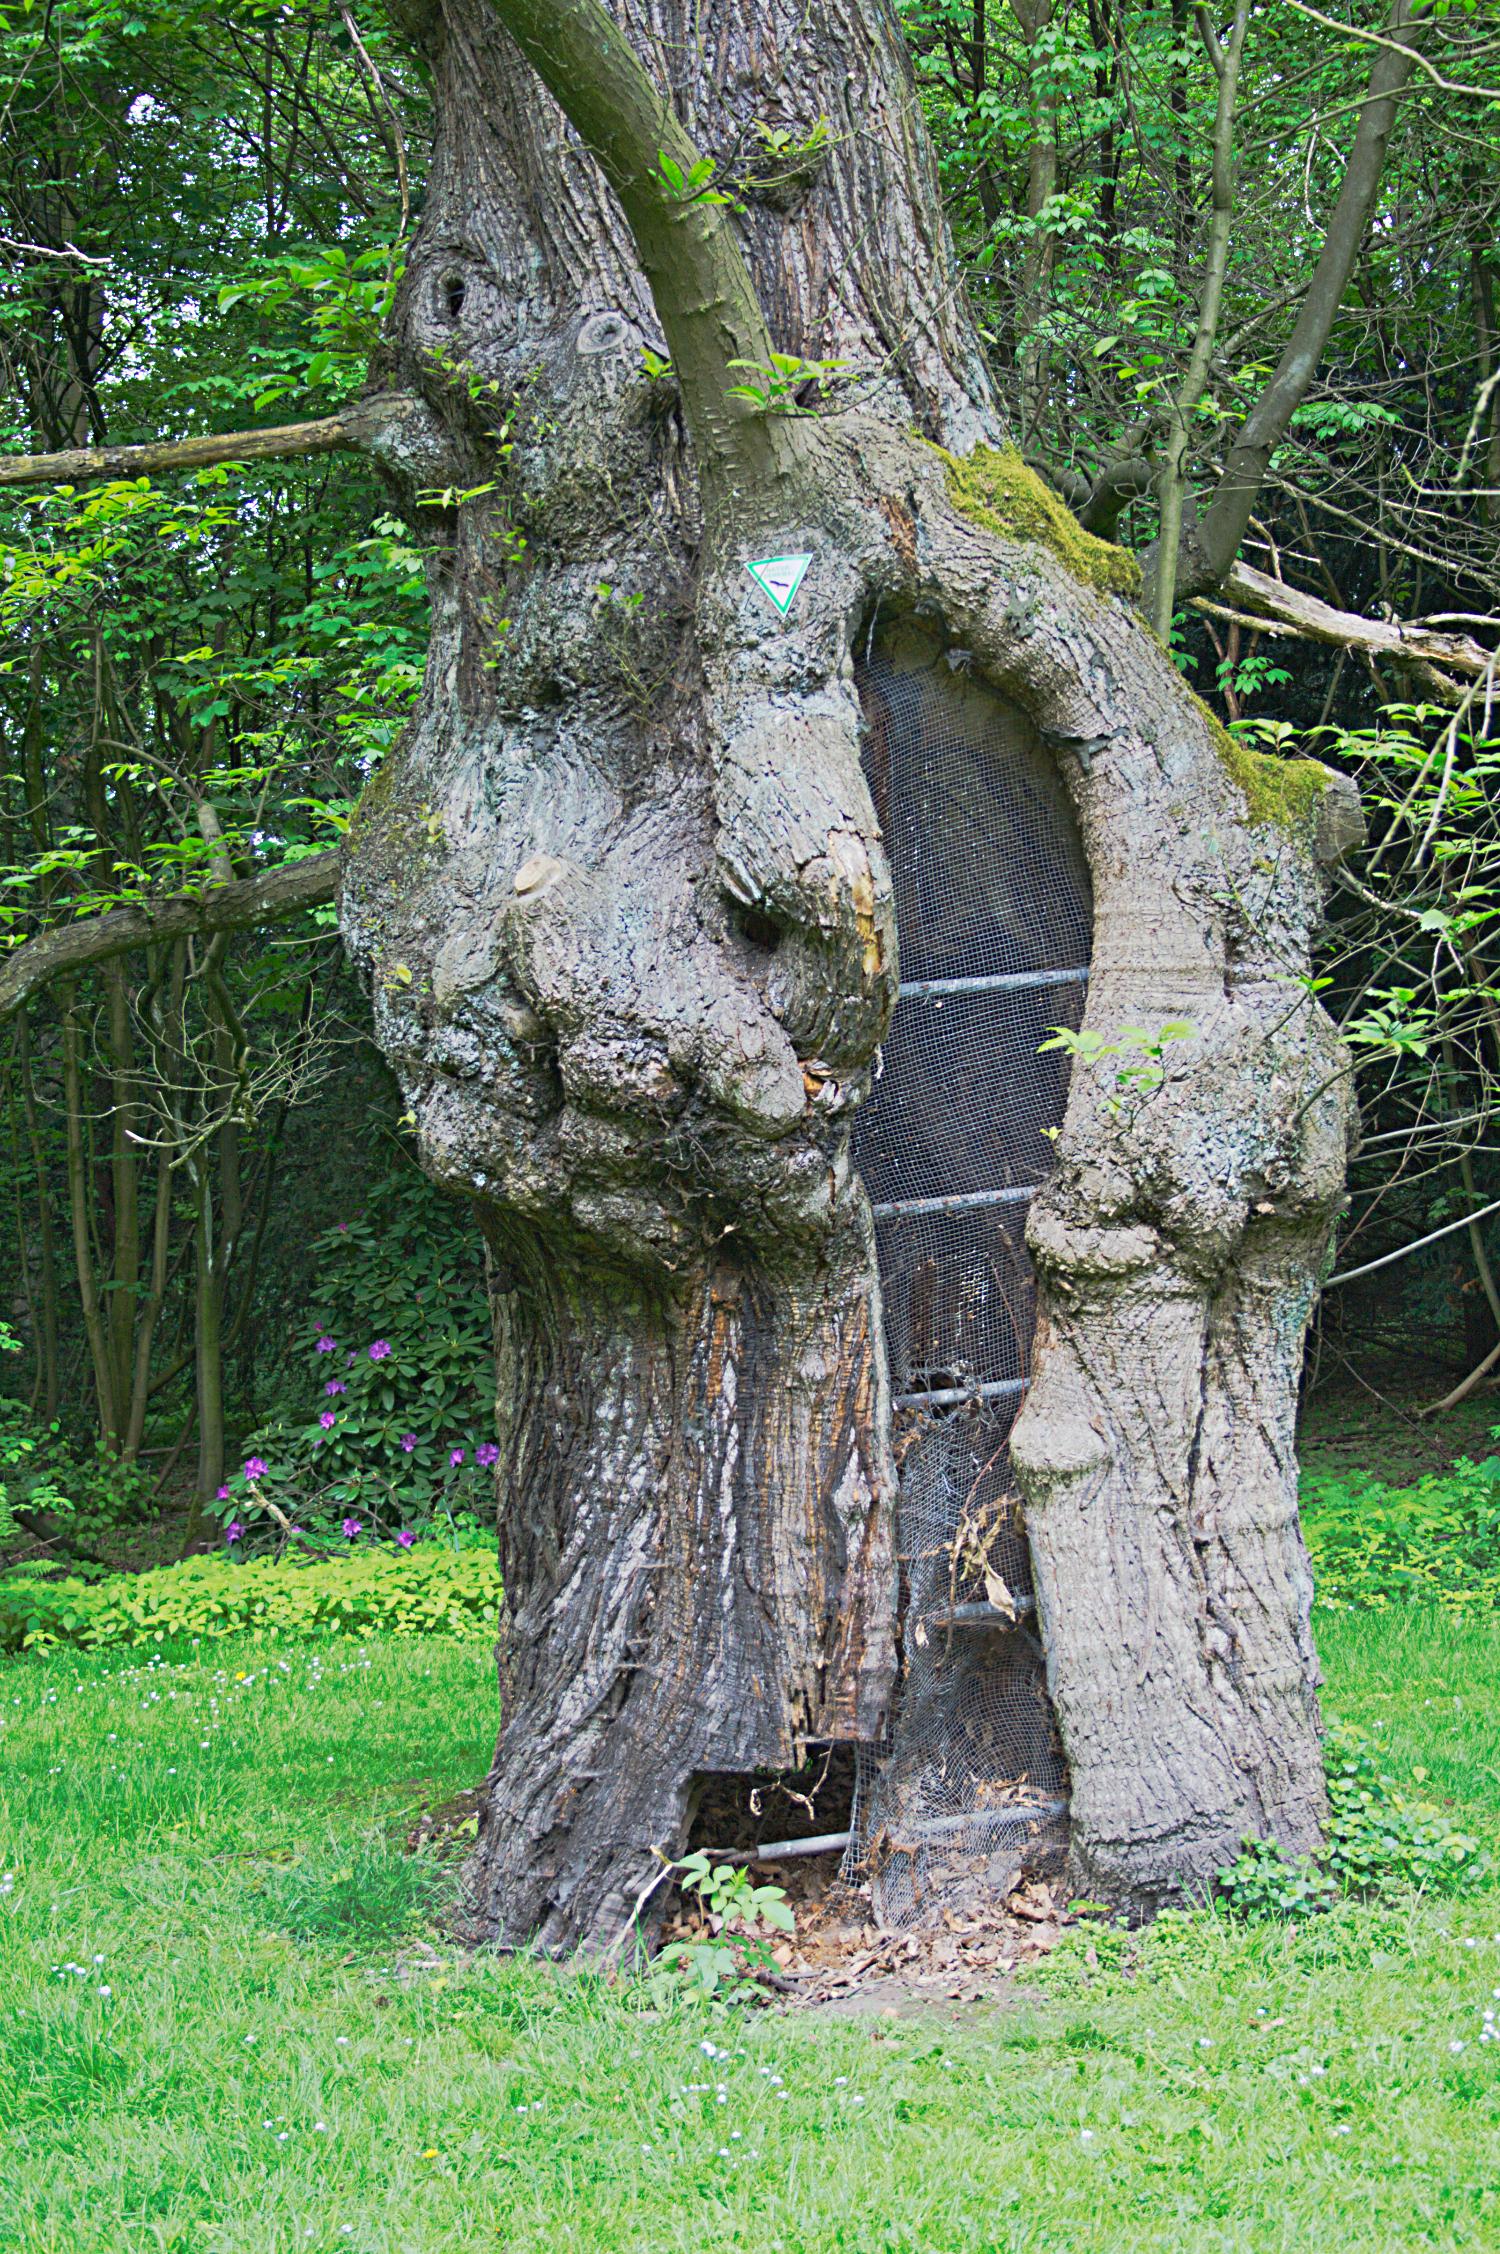 Charming File:2012 05 Naturdenkmal Marone Bochum Haus Weitmar (NRW) 01